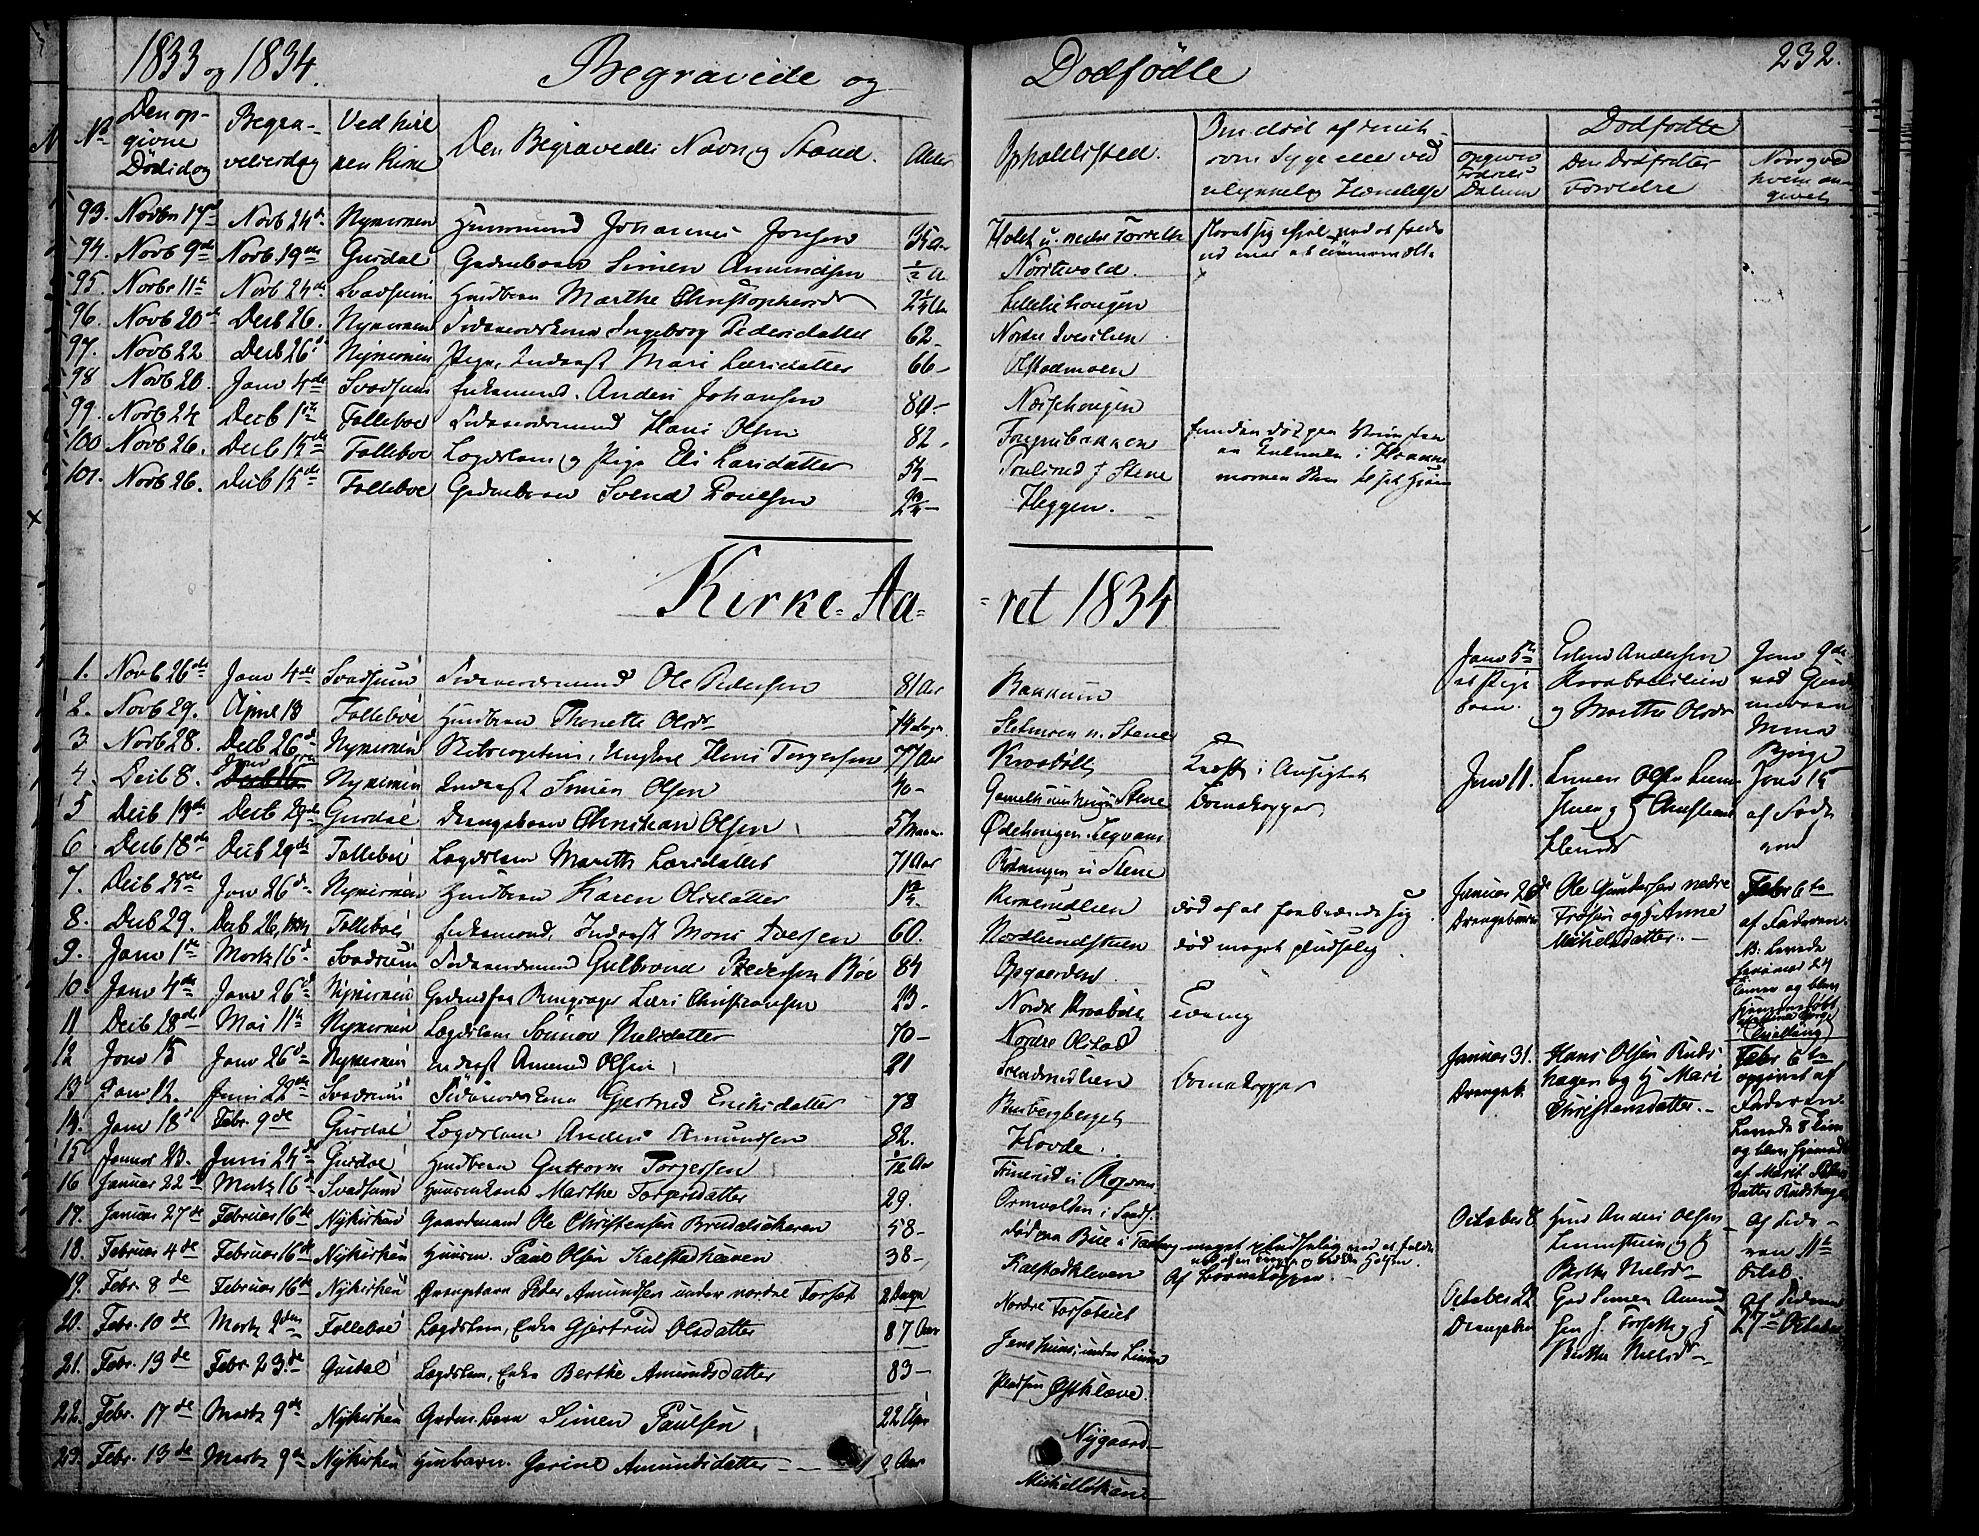 SAH, Gausdal prestekontor, Ministerialbok nr. 6, 1830-1839, s. 232